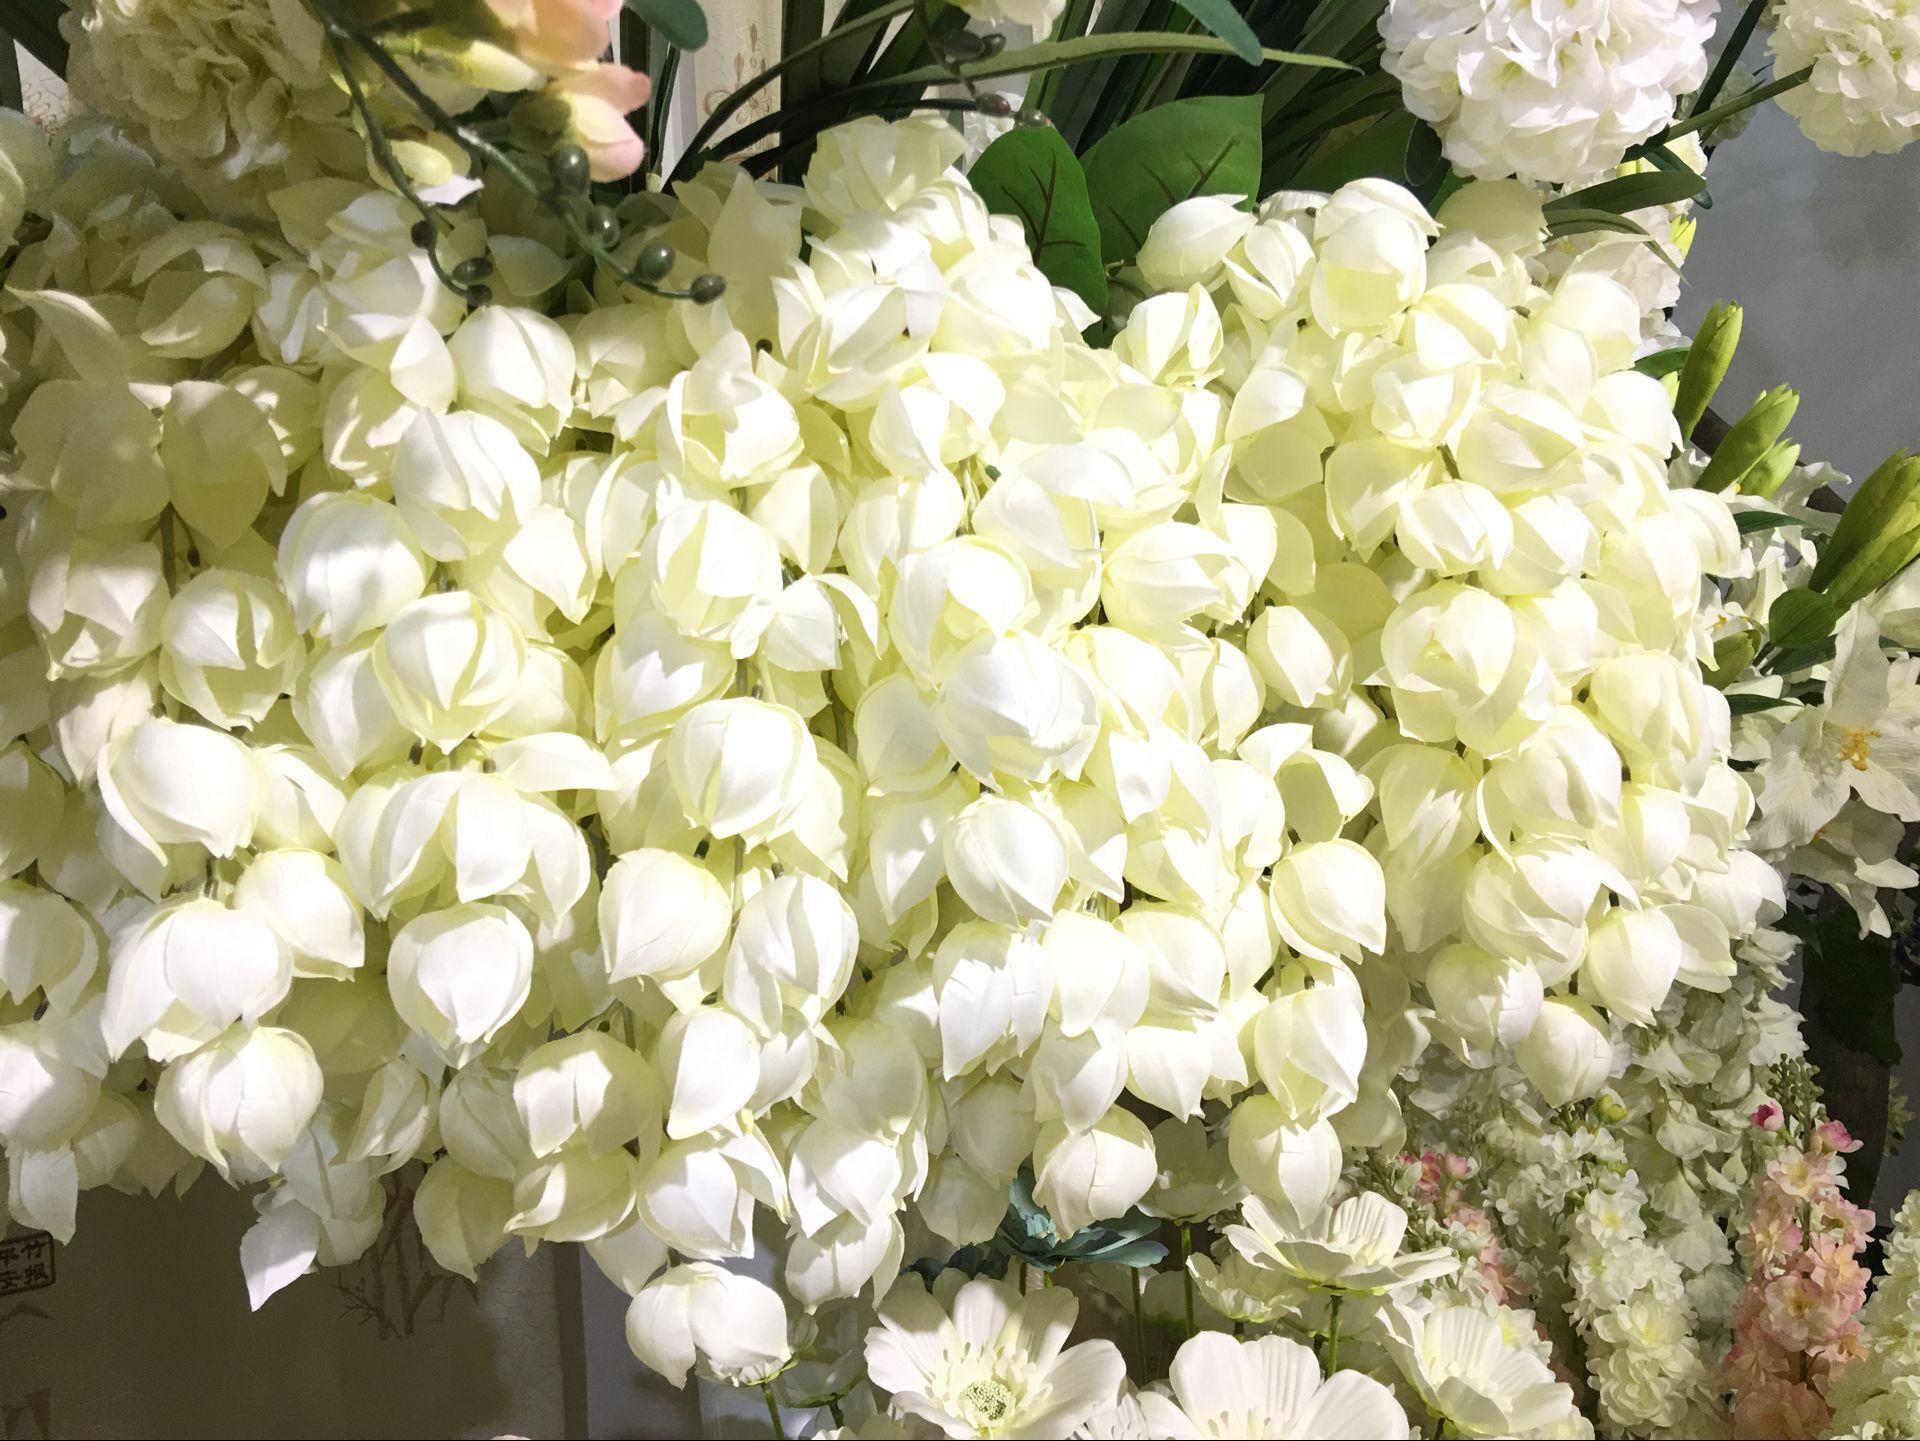 2016 NEW Artificial silk flower 1 Bouquet contain 25 small lanterns flower pendulous flower Rattan for Wedding Home decoration